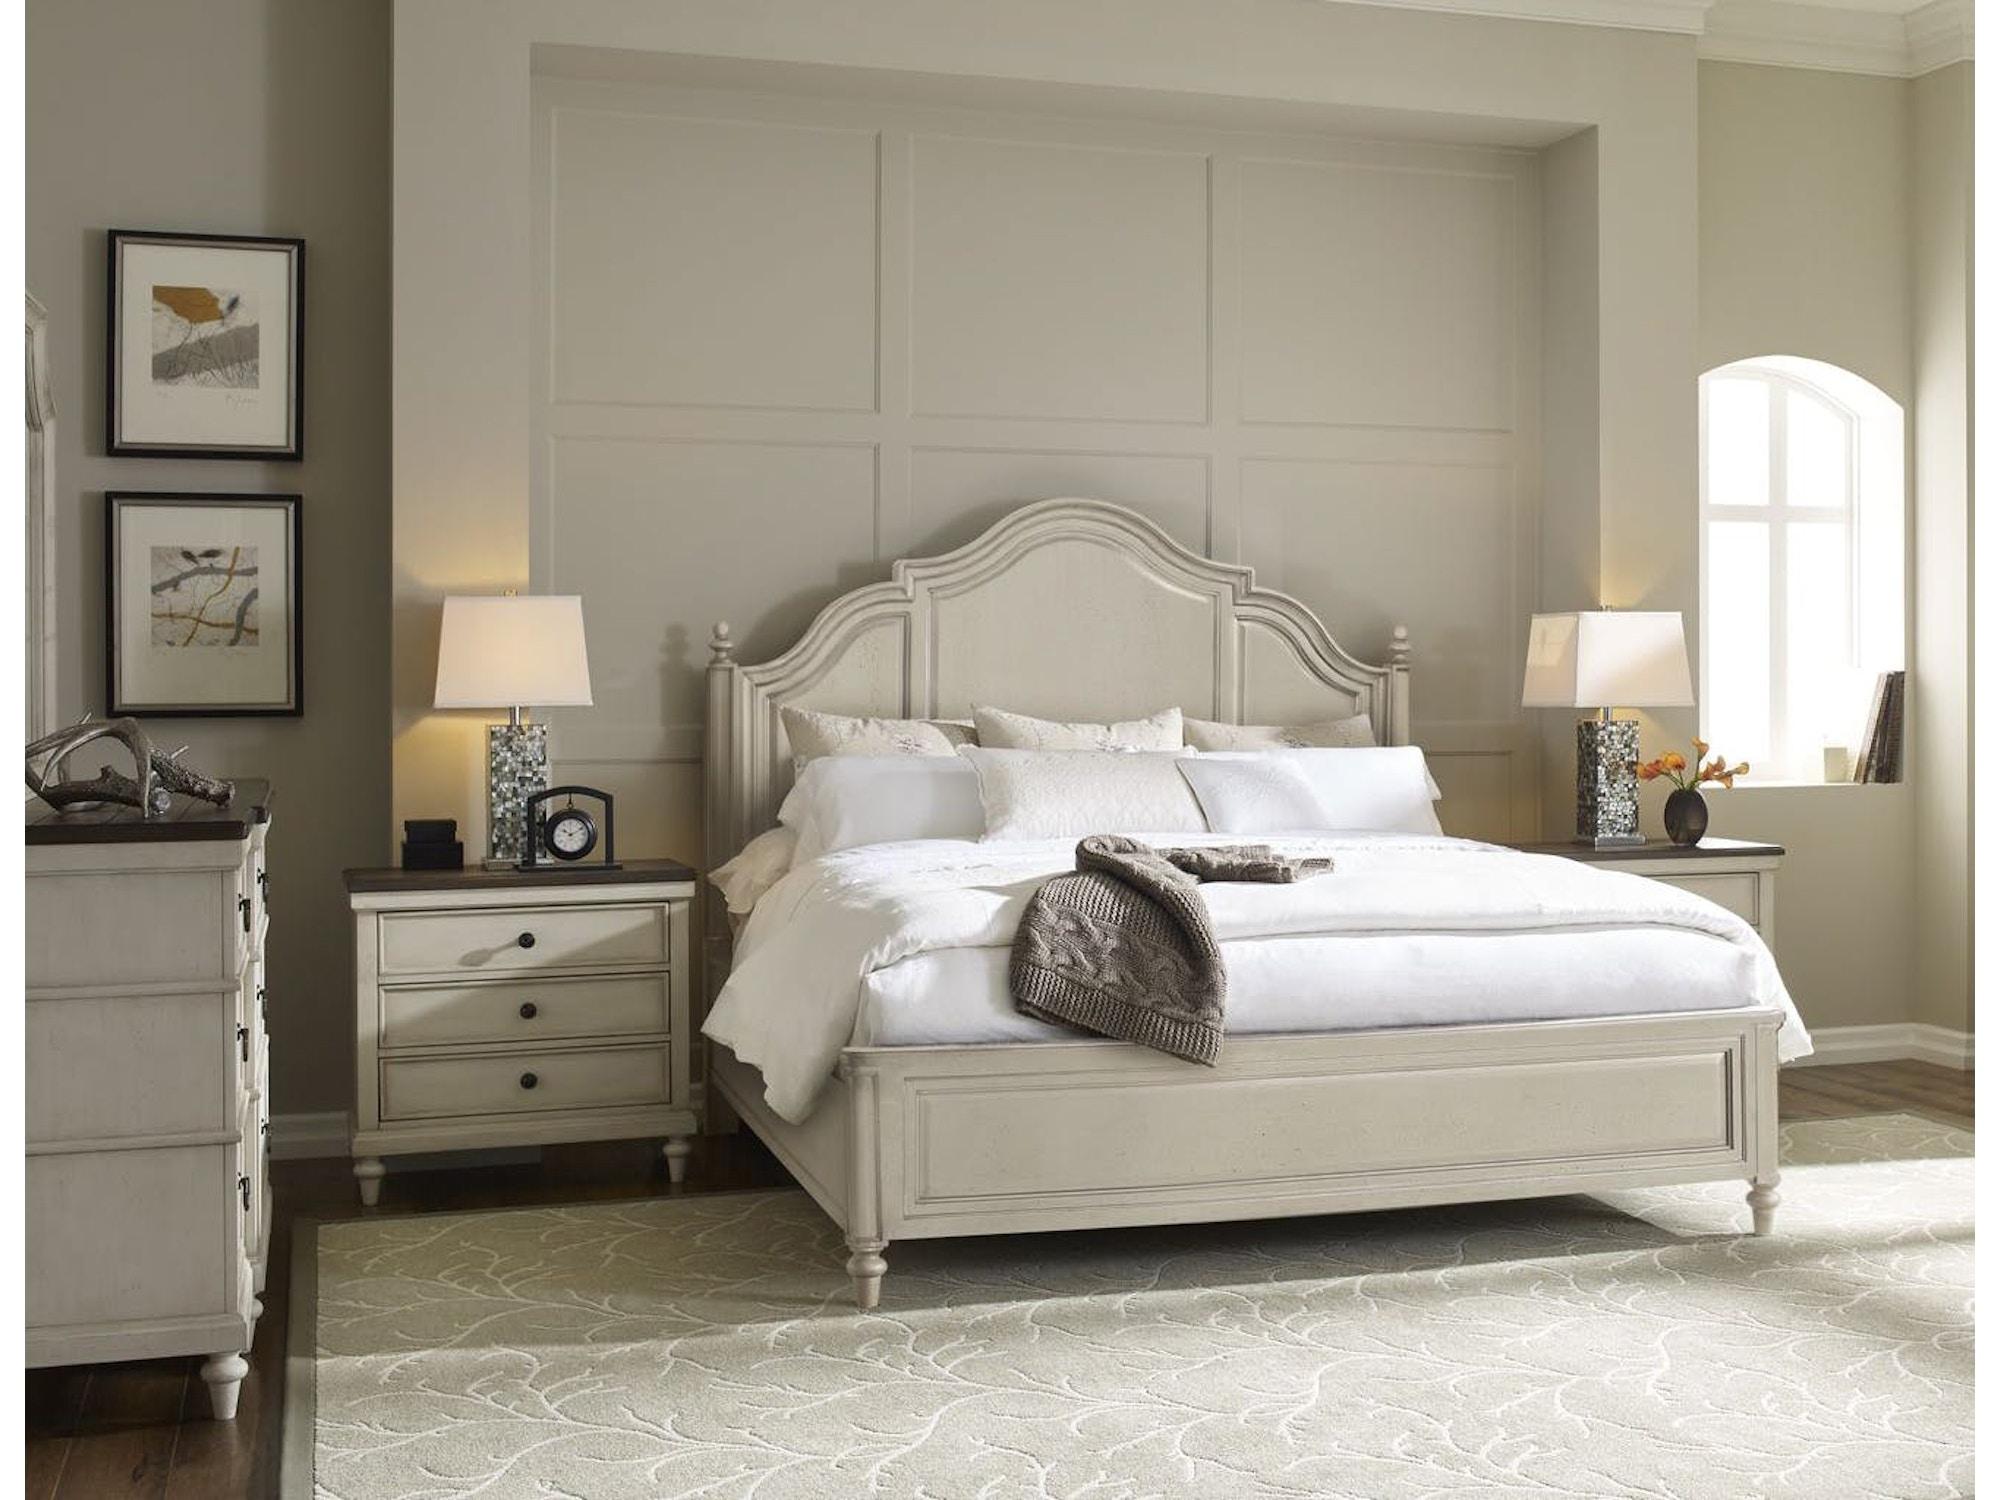 Bedroom Master Bedroom Sets - Furniture Fair - Cincinnati & Dayton ...